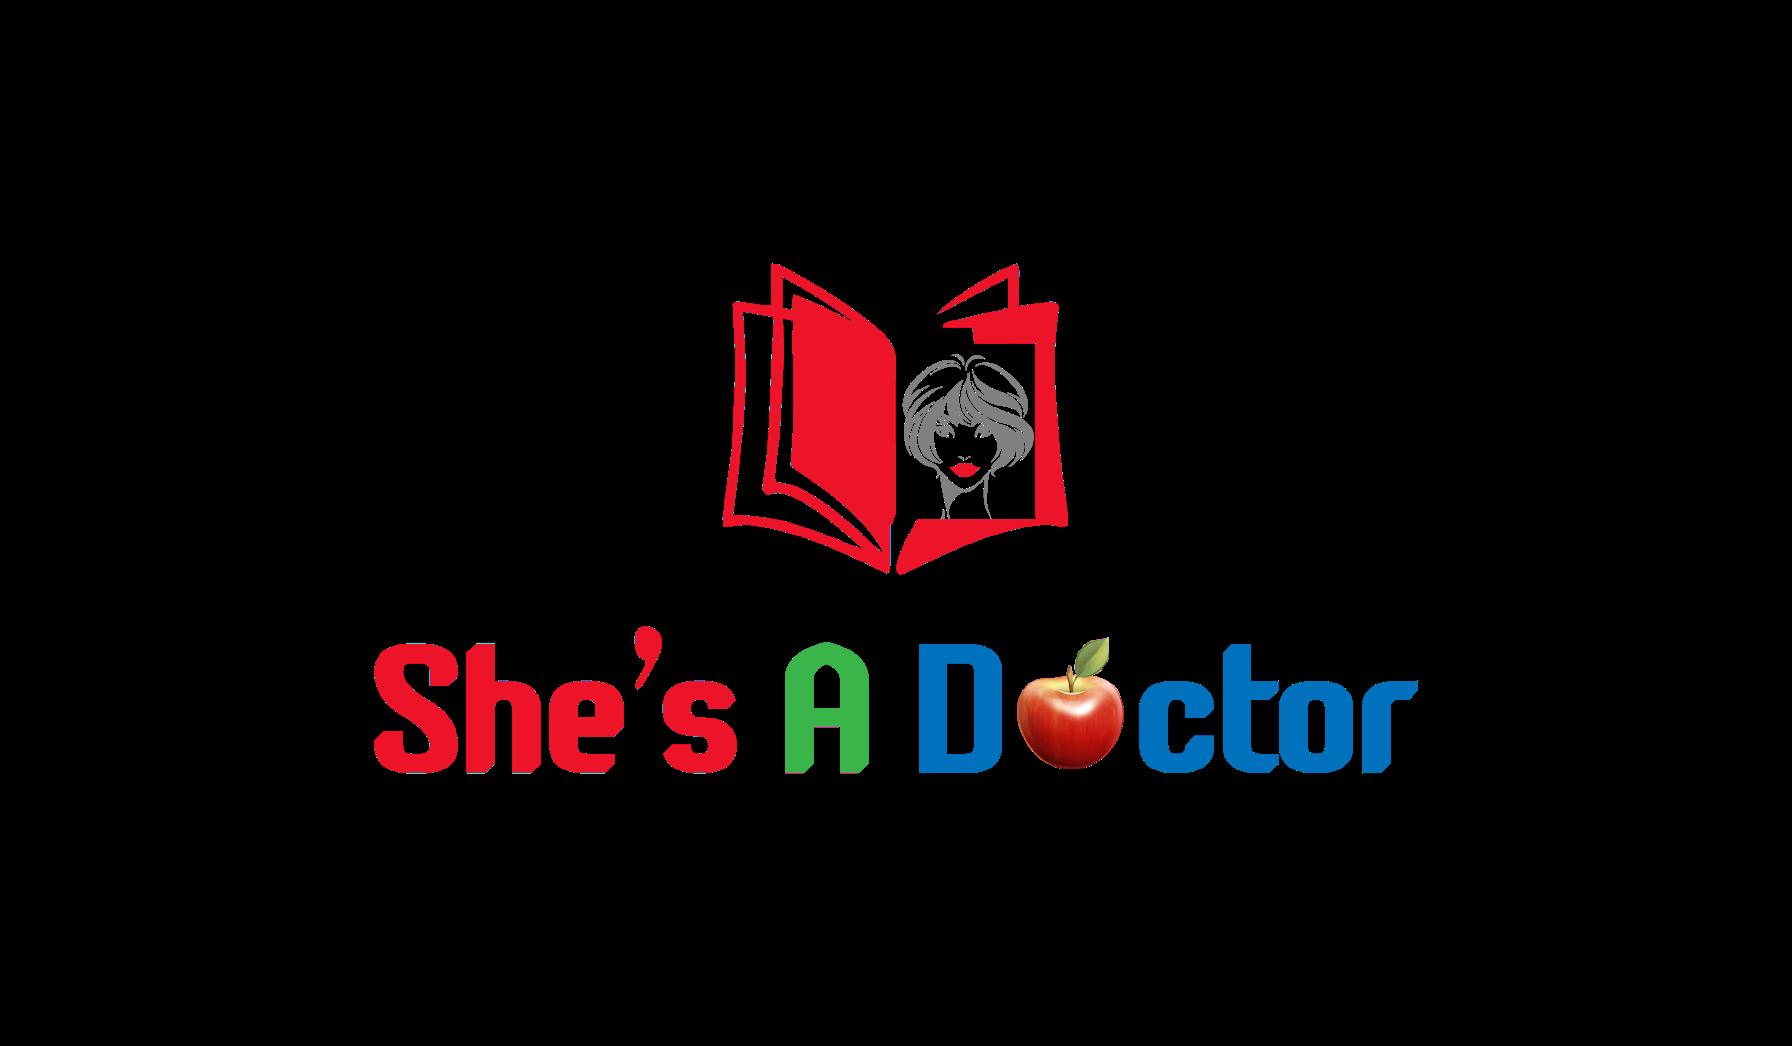 Shesadoctor logo